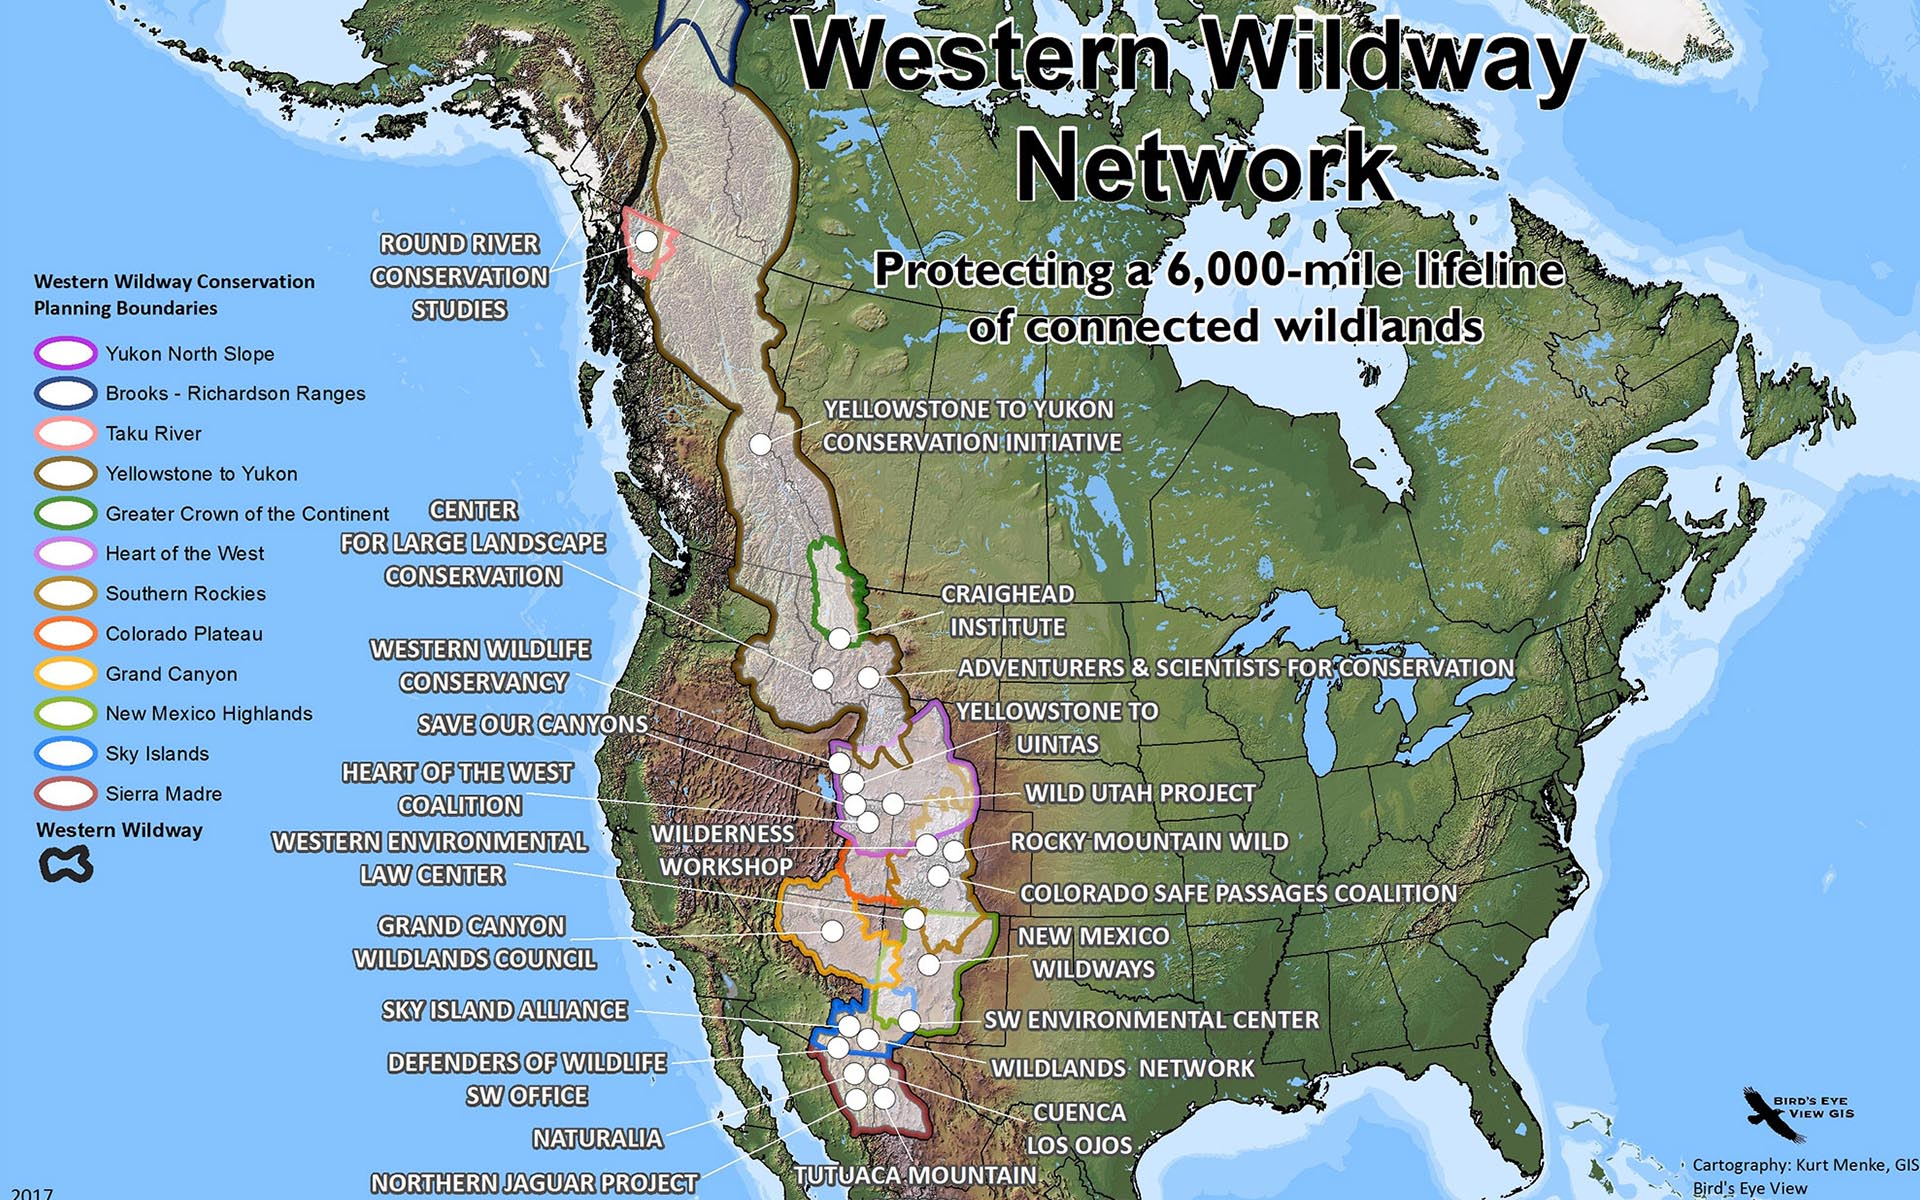 Permalink to:Western Wildway